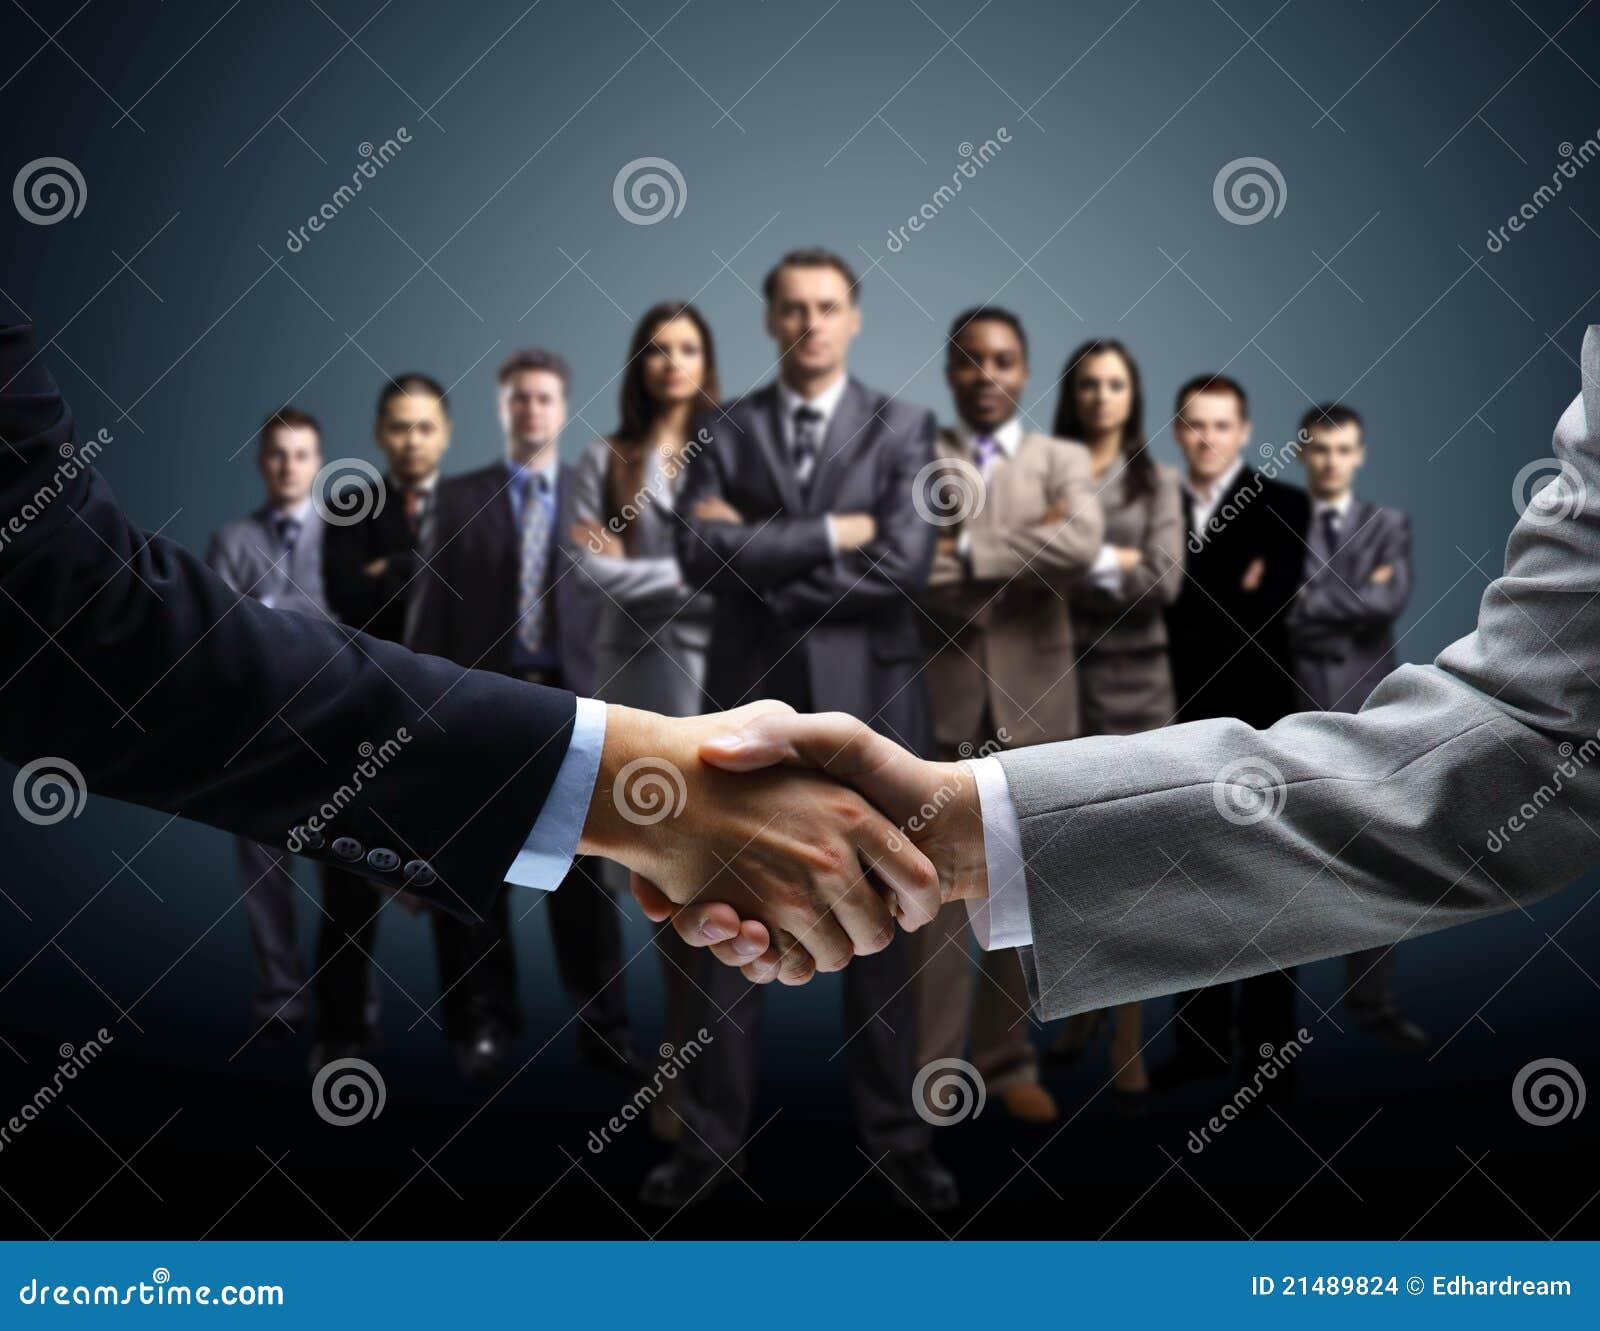 Handshake on business